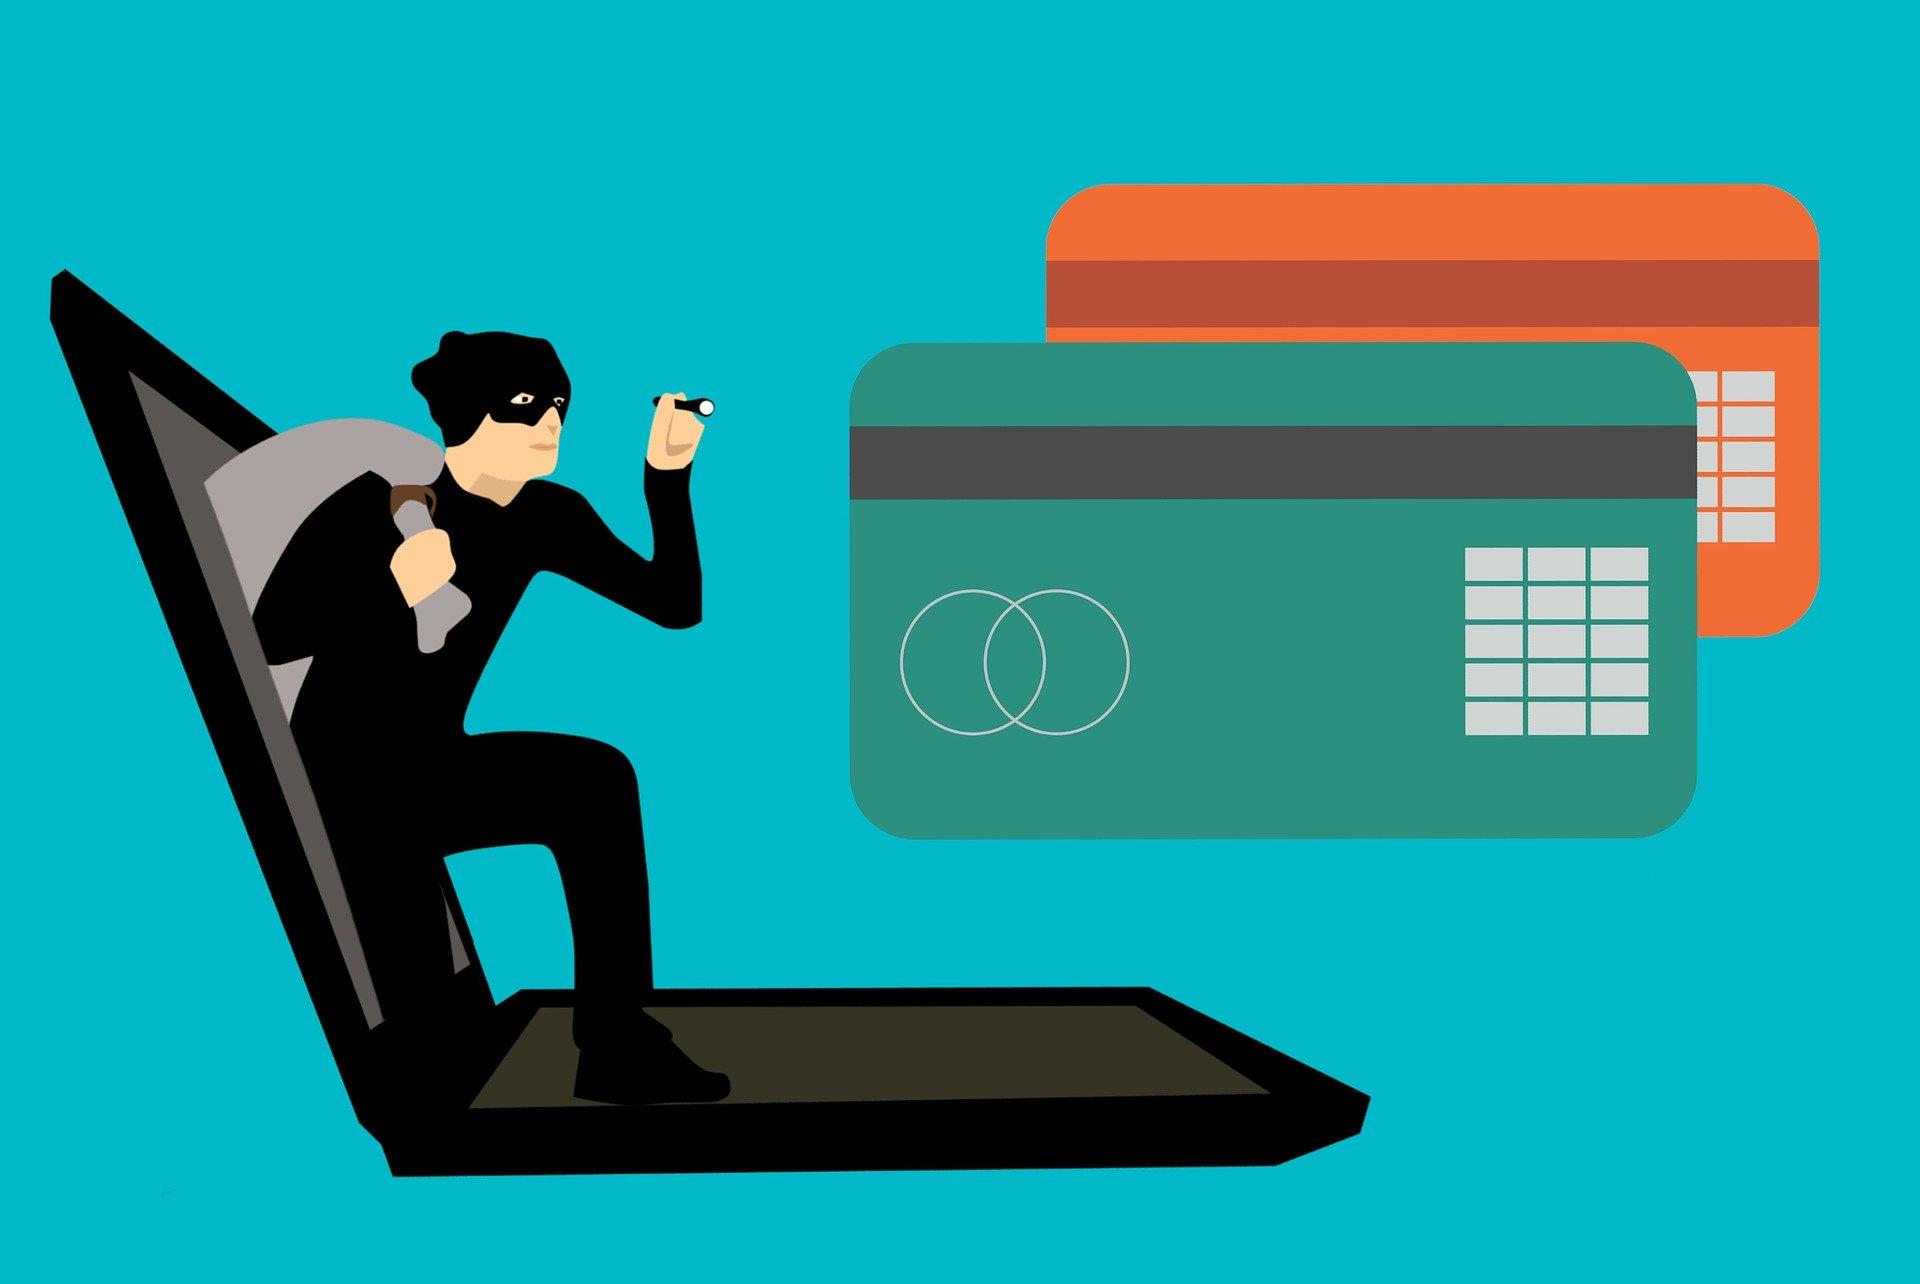 Fraudulent Credit Card Application